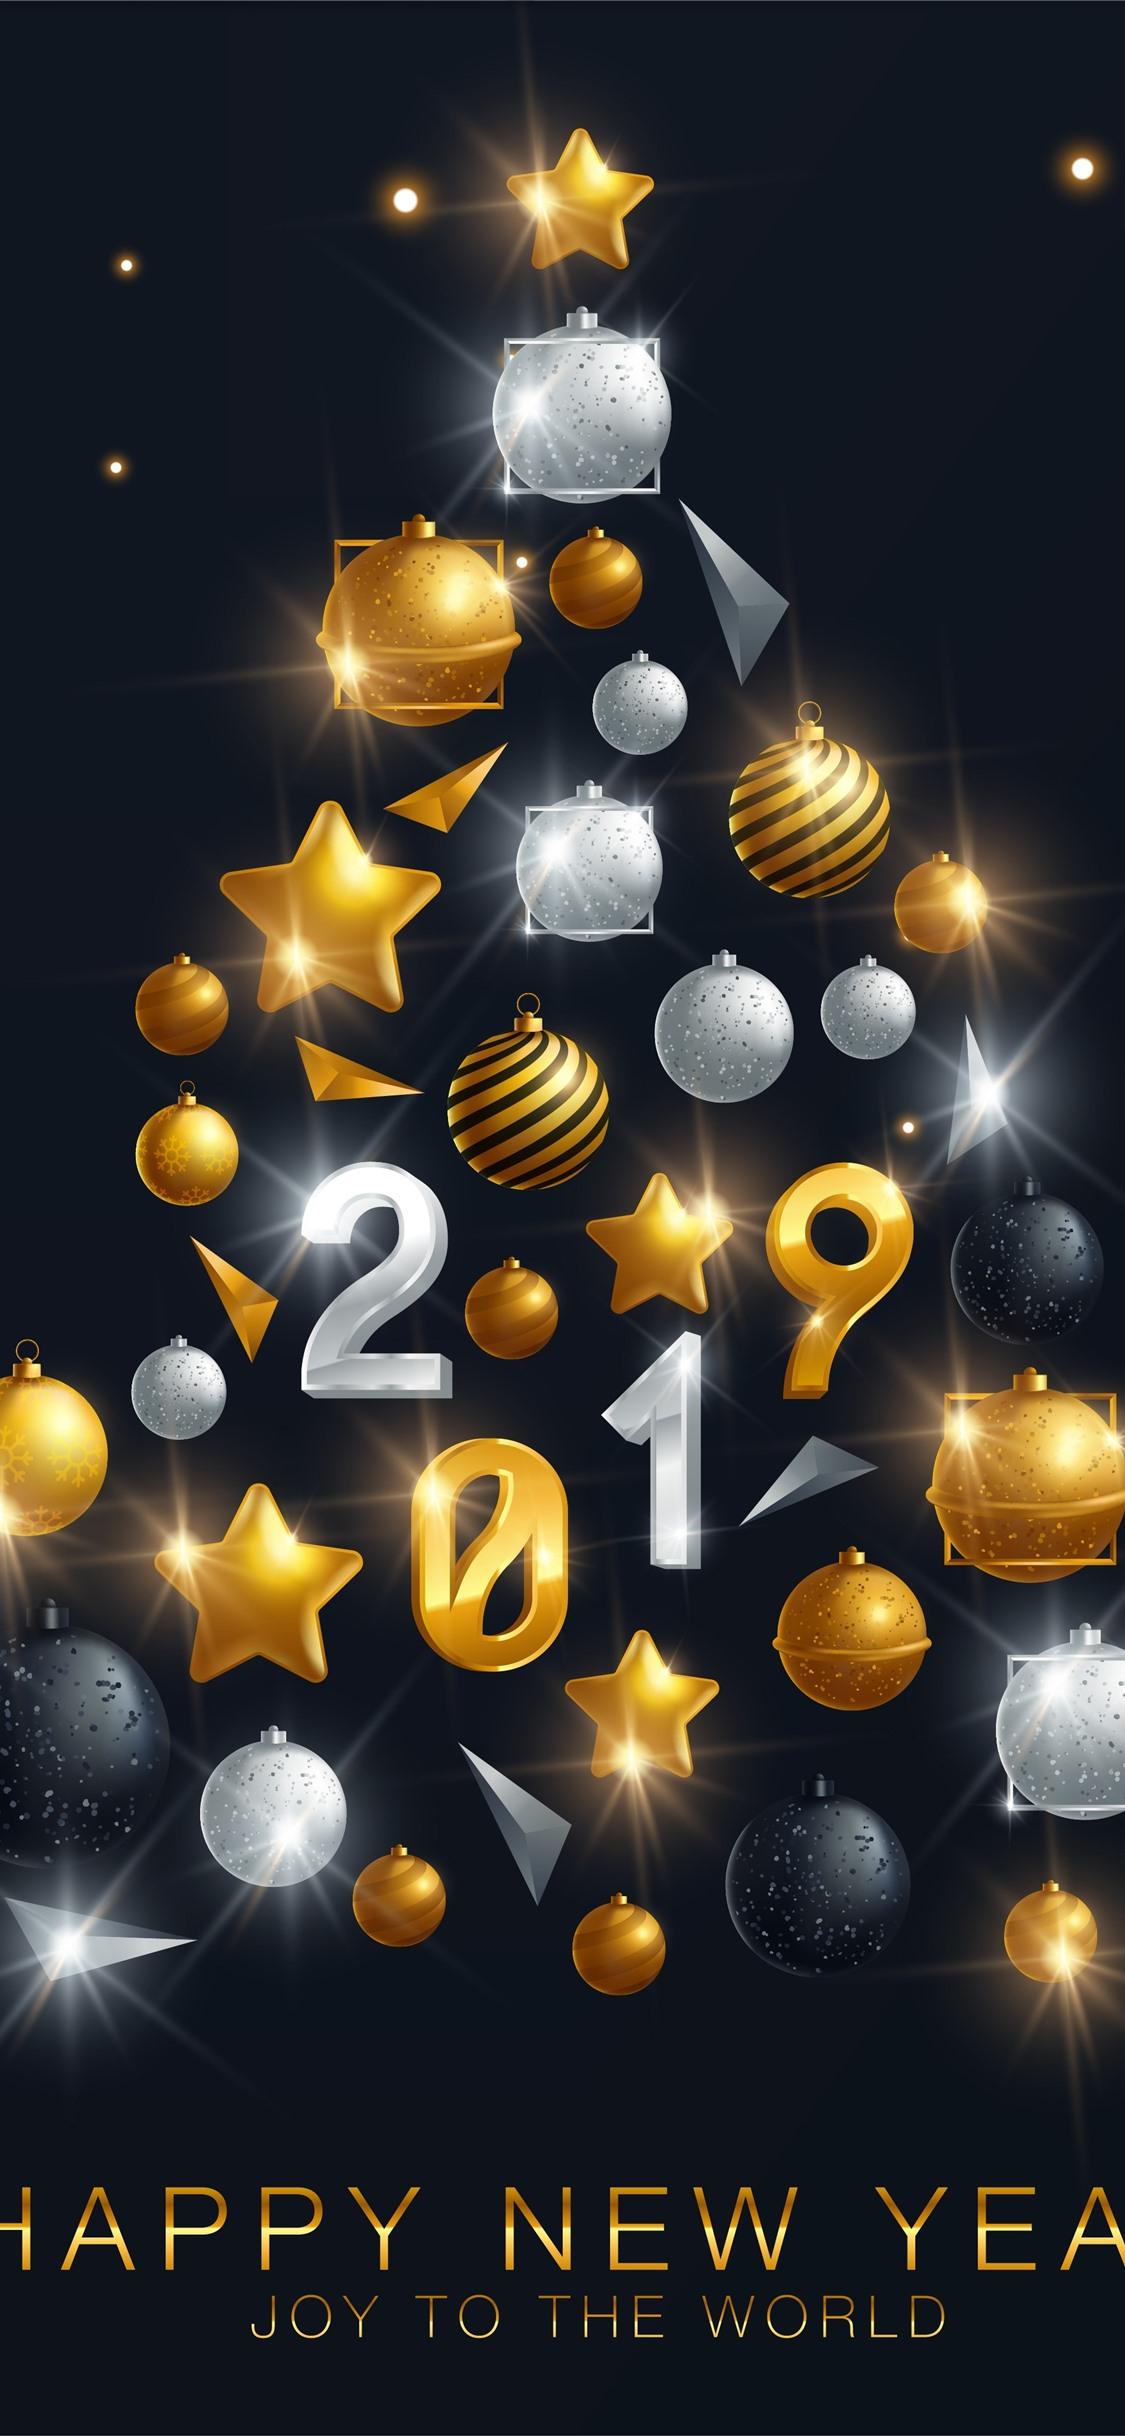 Wallpaper Happy New Year 2019 Christmas Tree Decoration